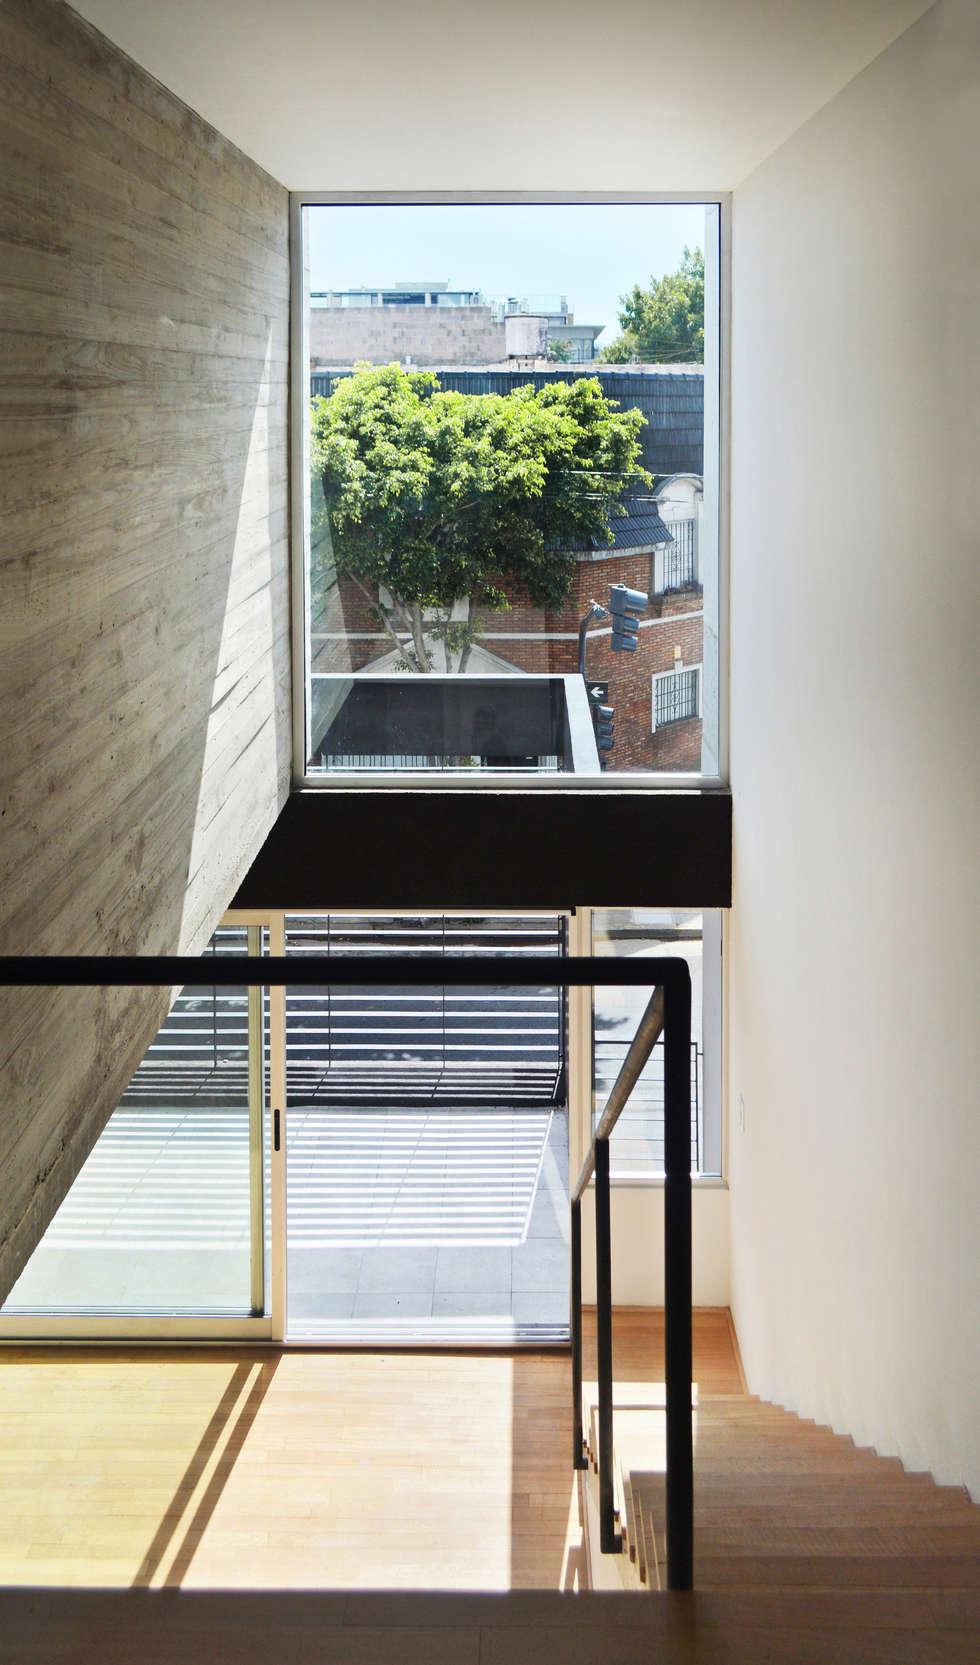 Doble altura: Dormitorios de estilo moderno por F2M Arquitectos